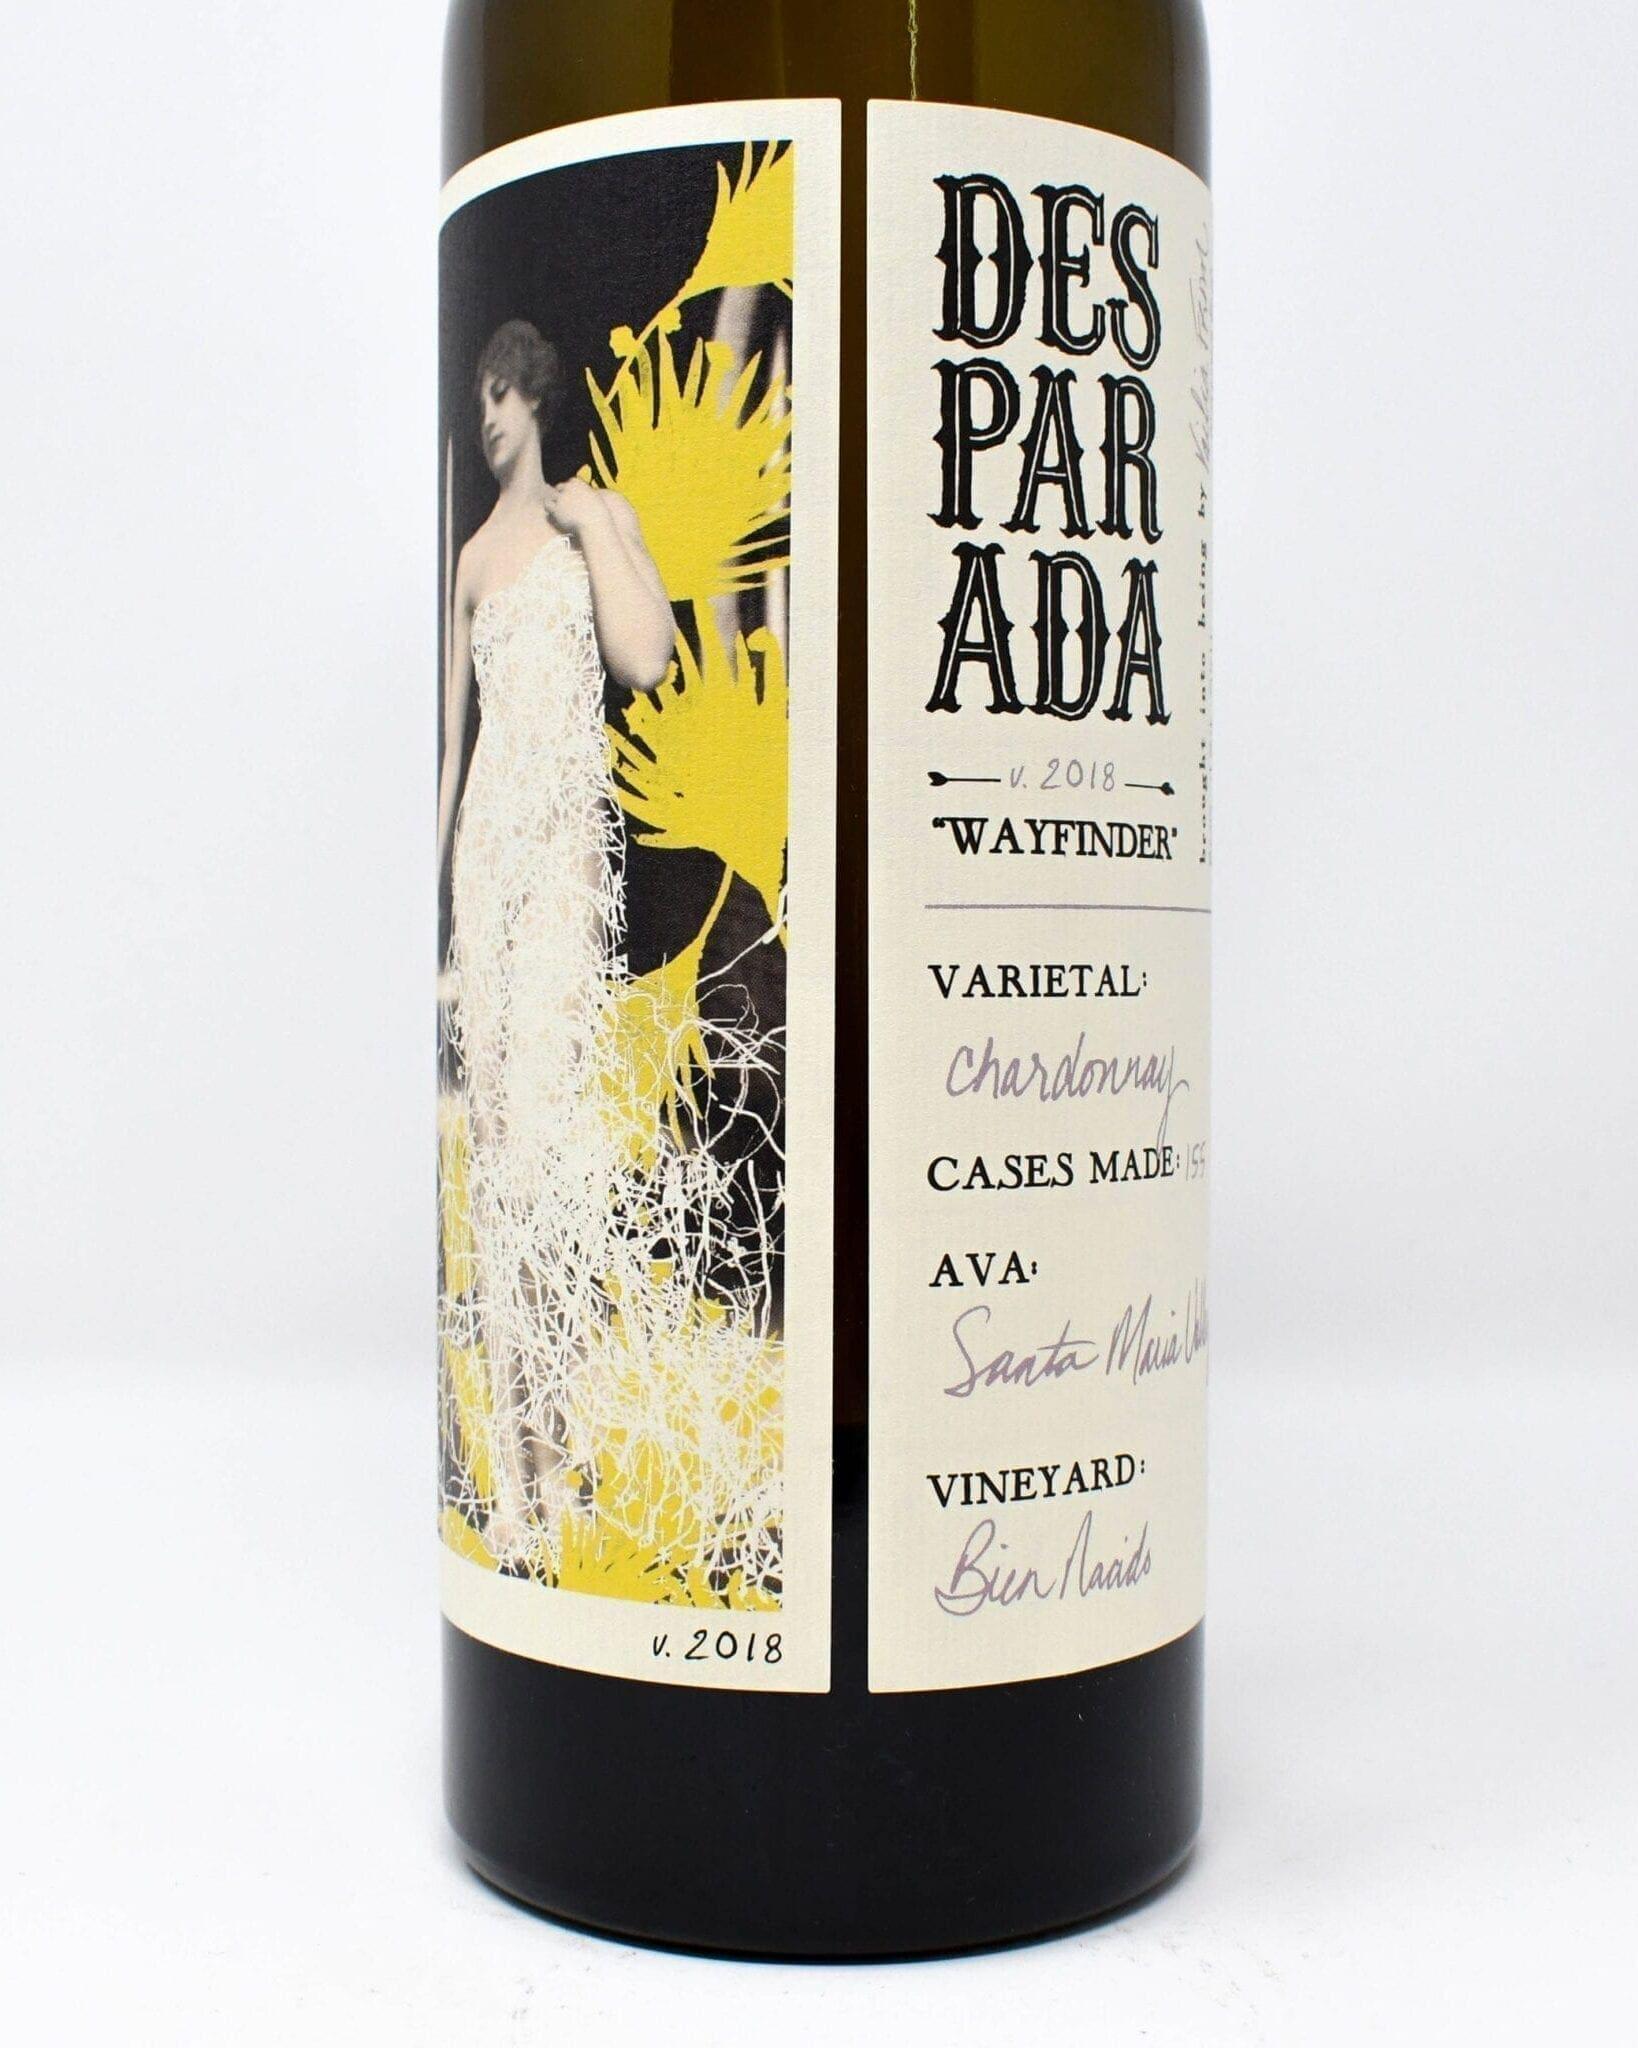 Desparada Wayfinder Chardonnay